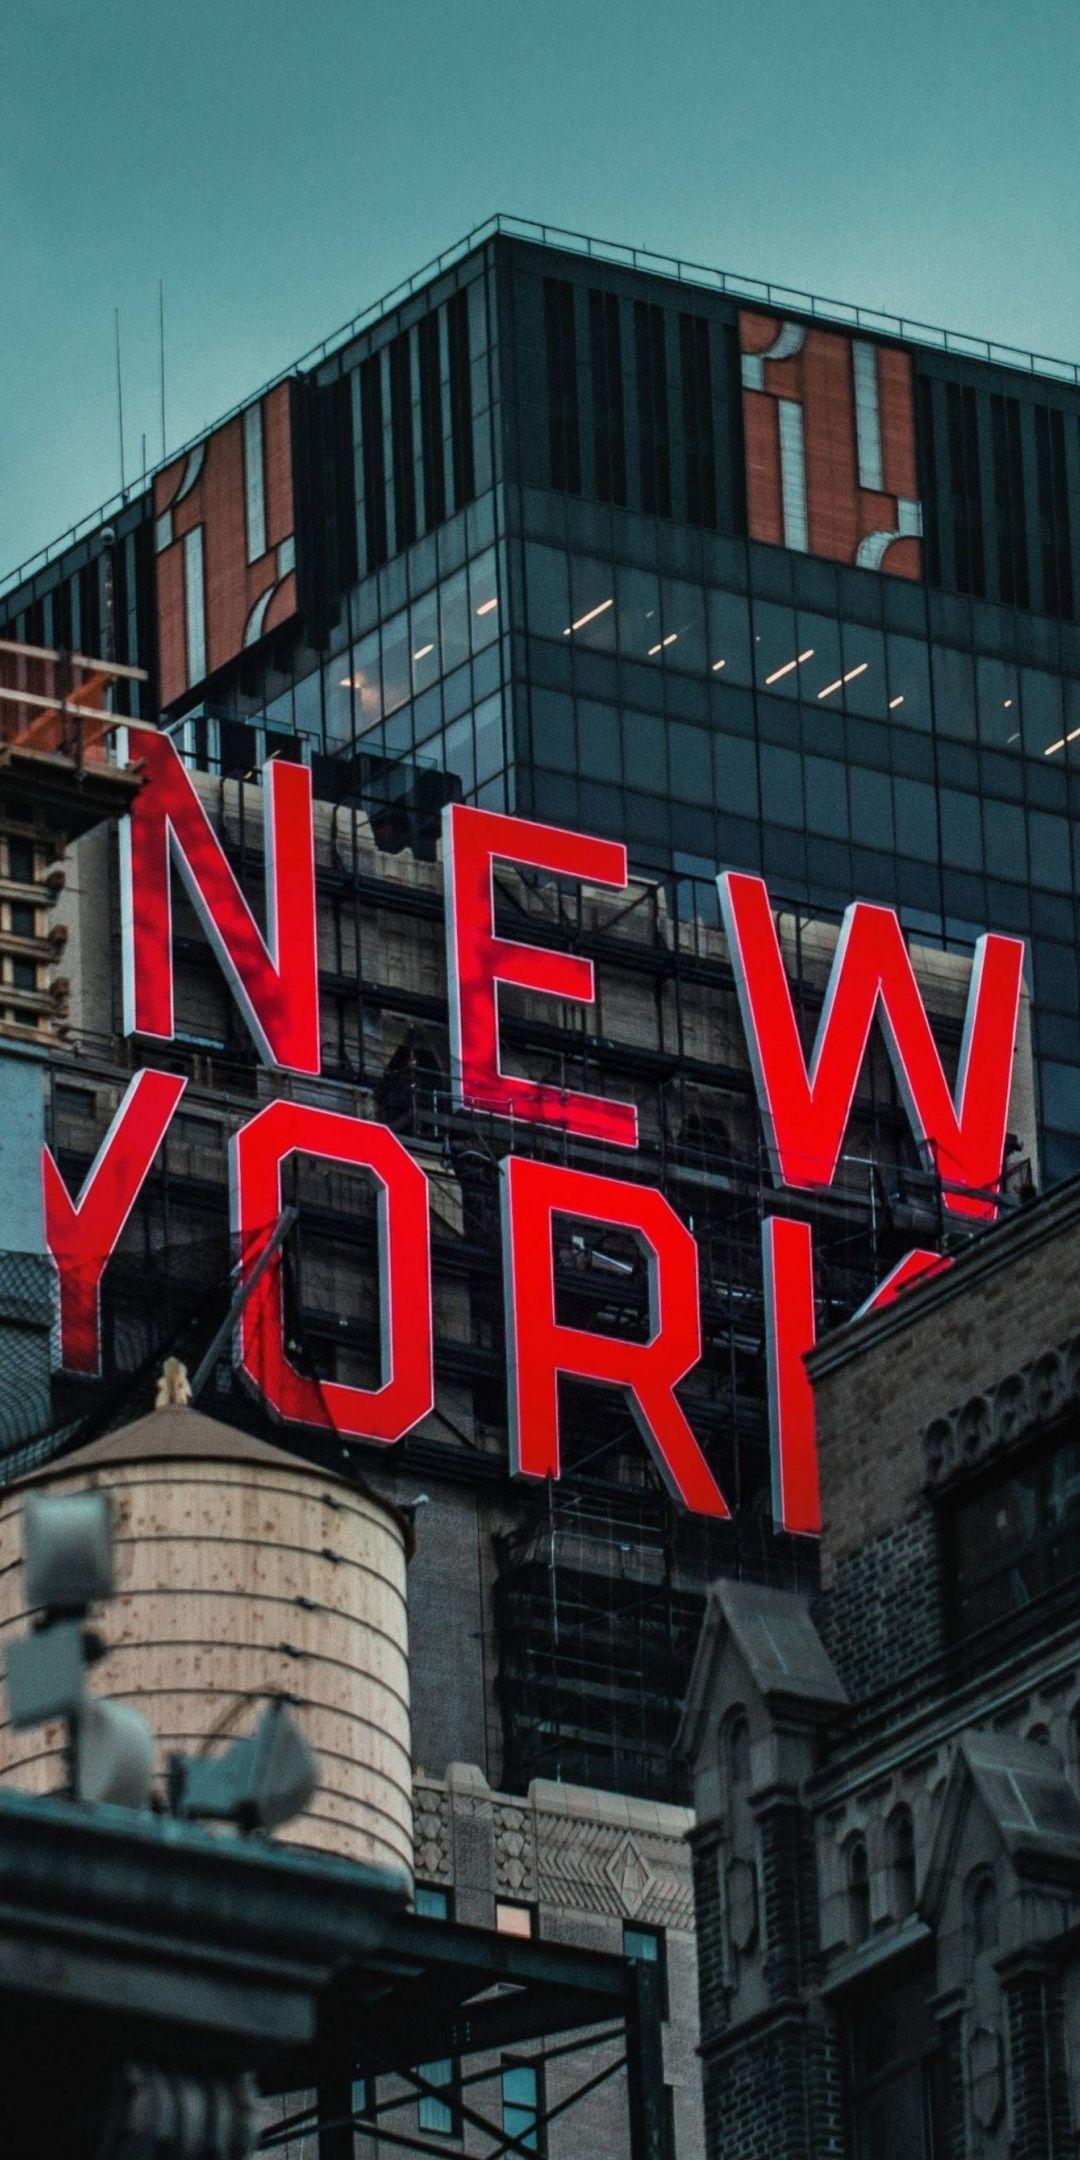 New York, inscription, buildings, 1080x2160 wallpaper